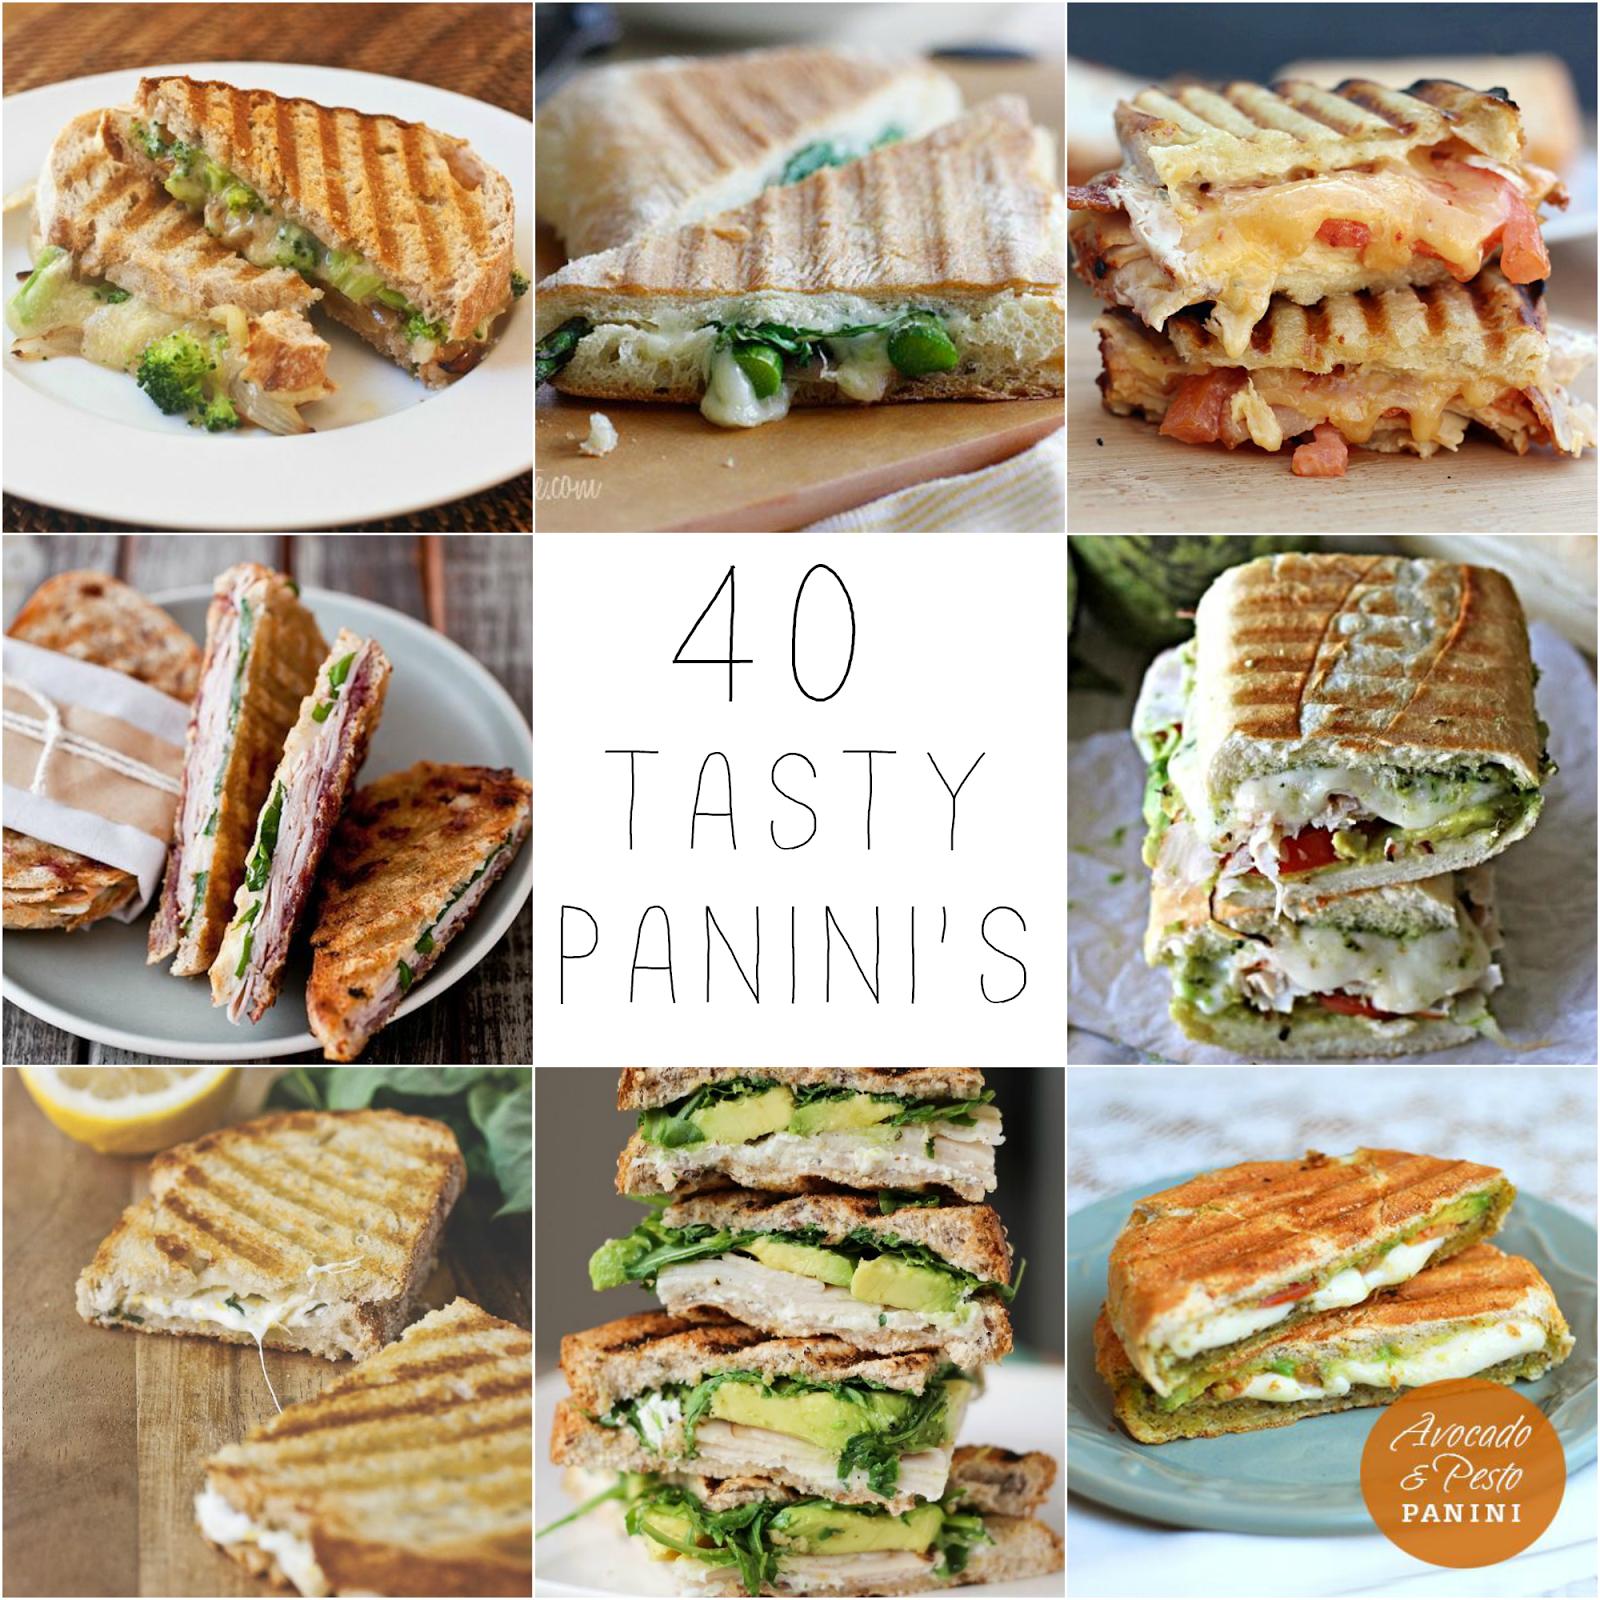 40 panini recipes sandwiches comida y recetas 40 panini recipes forumfinder Image collections